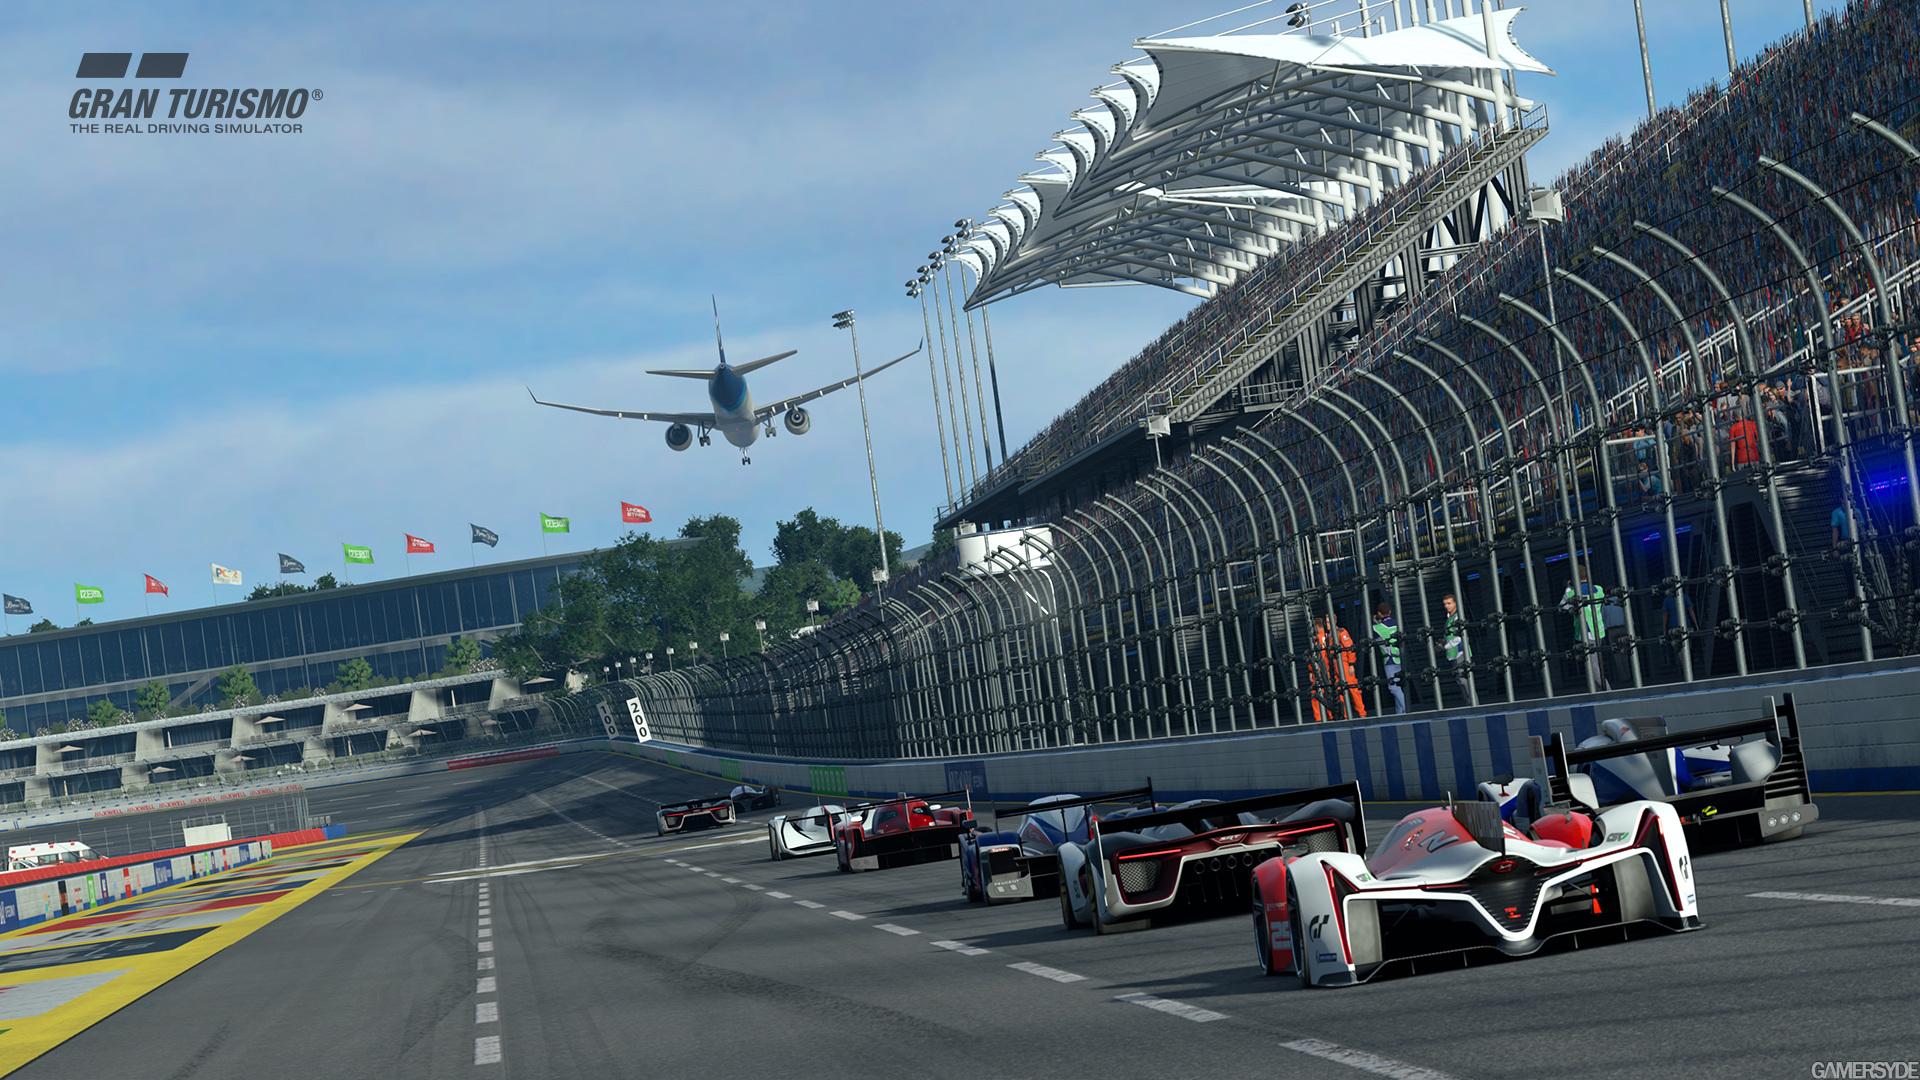 【CS史上初】Forza7・XboxOne X vs GTSports・PS4Pro【4K60fpsタイトル対決】 [無断転載禁止]©2ch.netYouTube動画>19本 ->画像>153枚